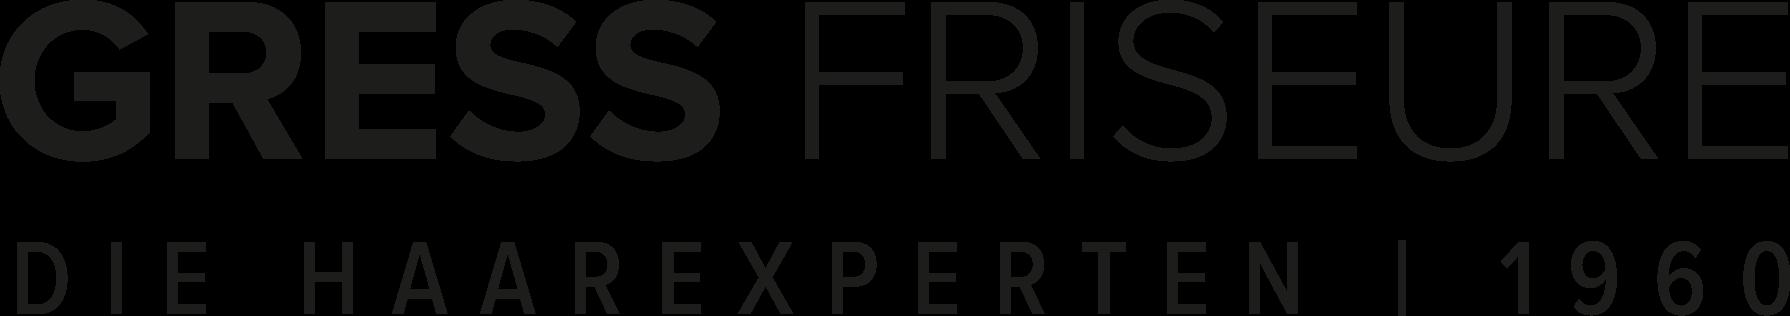 Gress Friseure - Die Haarexperten